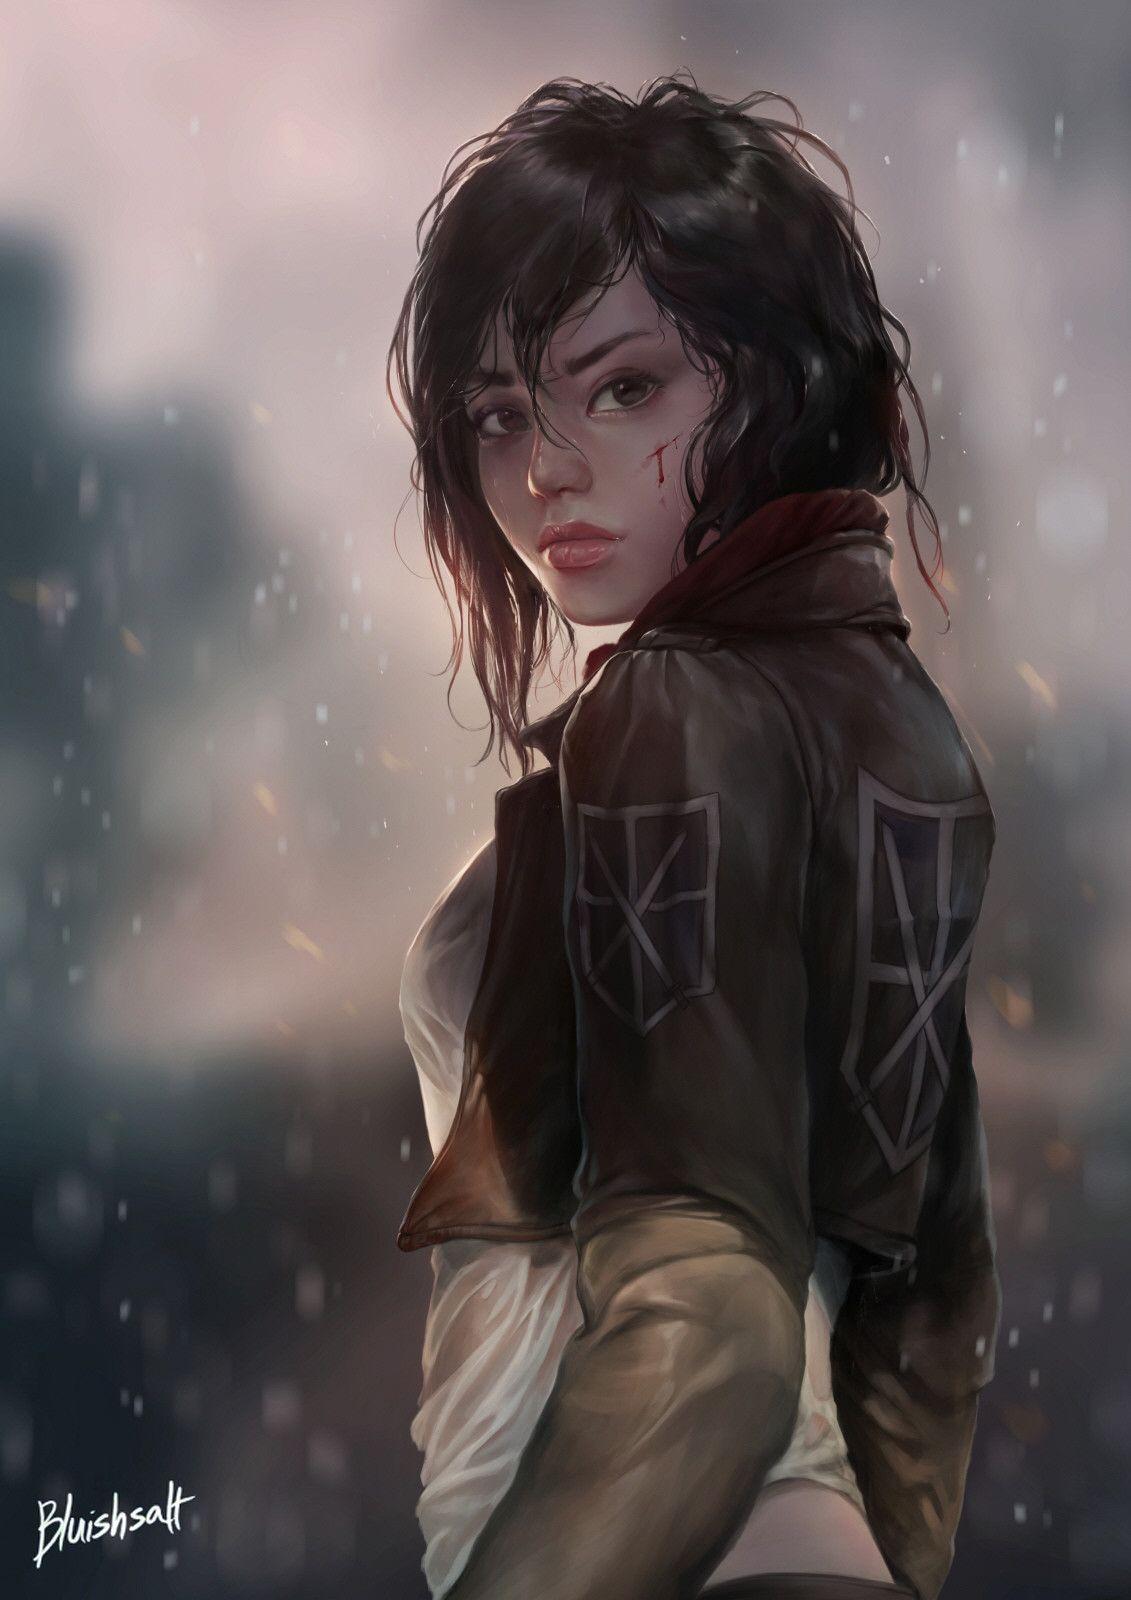 Mikasa Ackerman, Bluish Salt